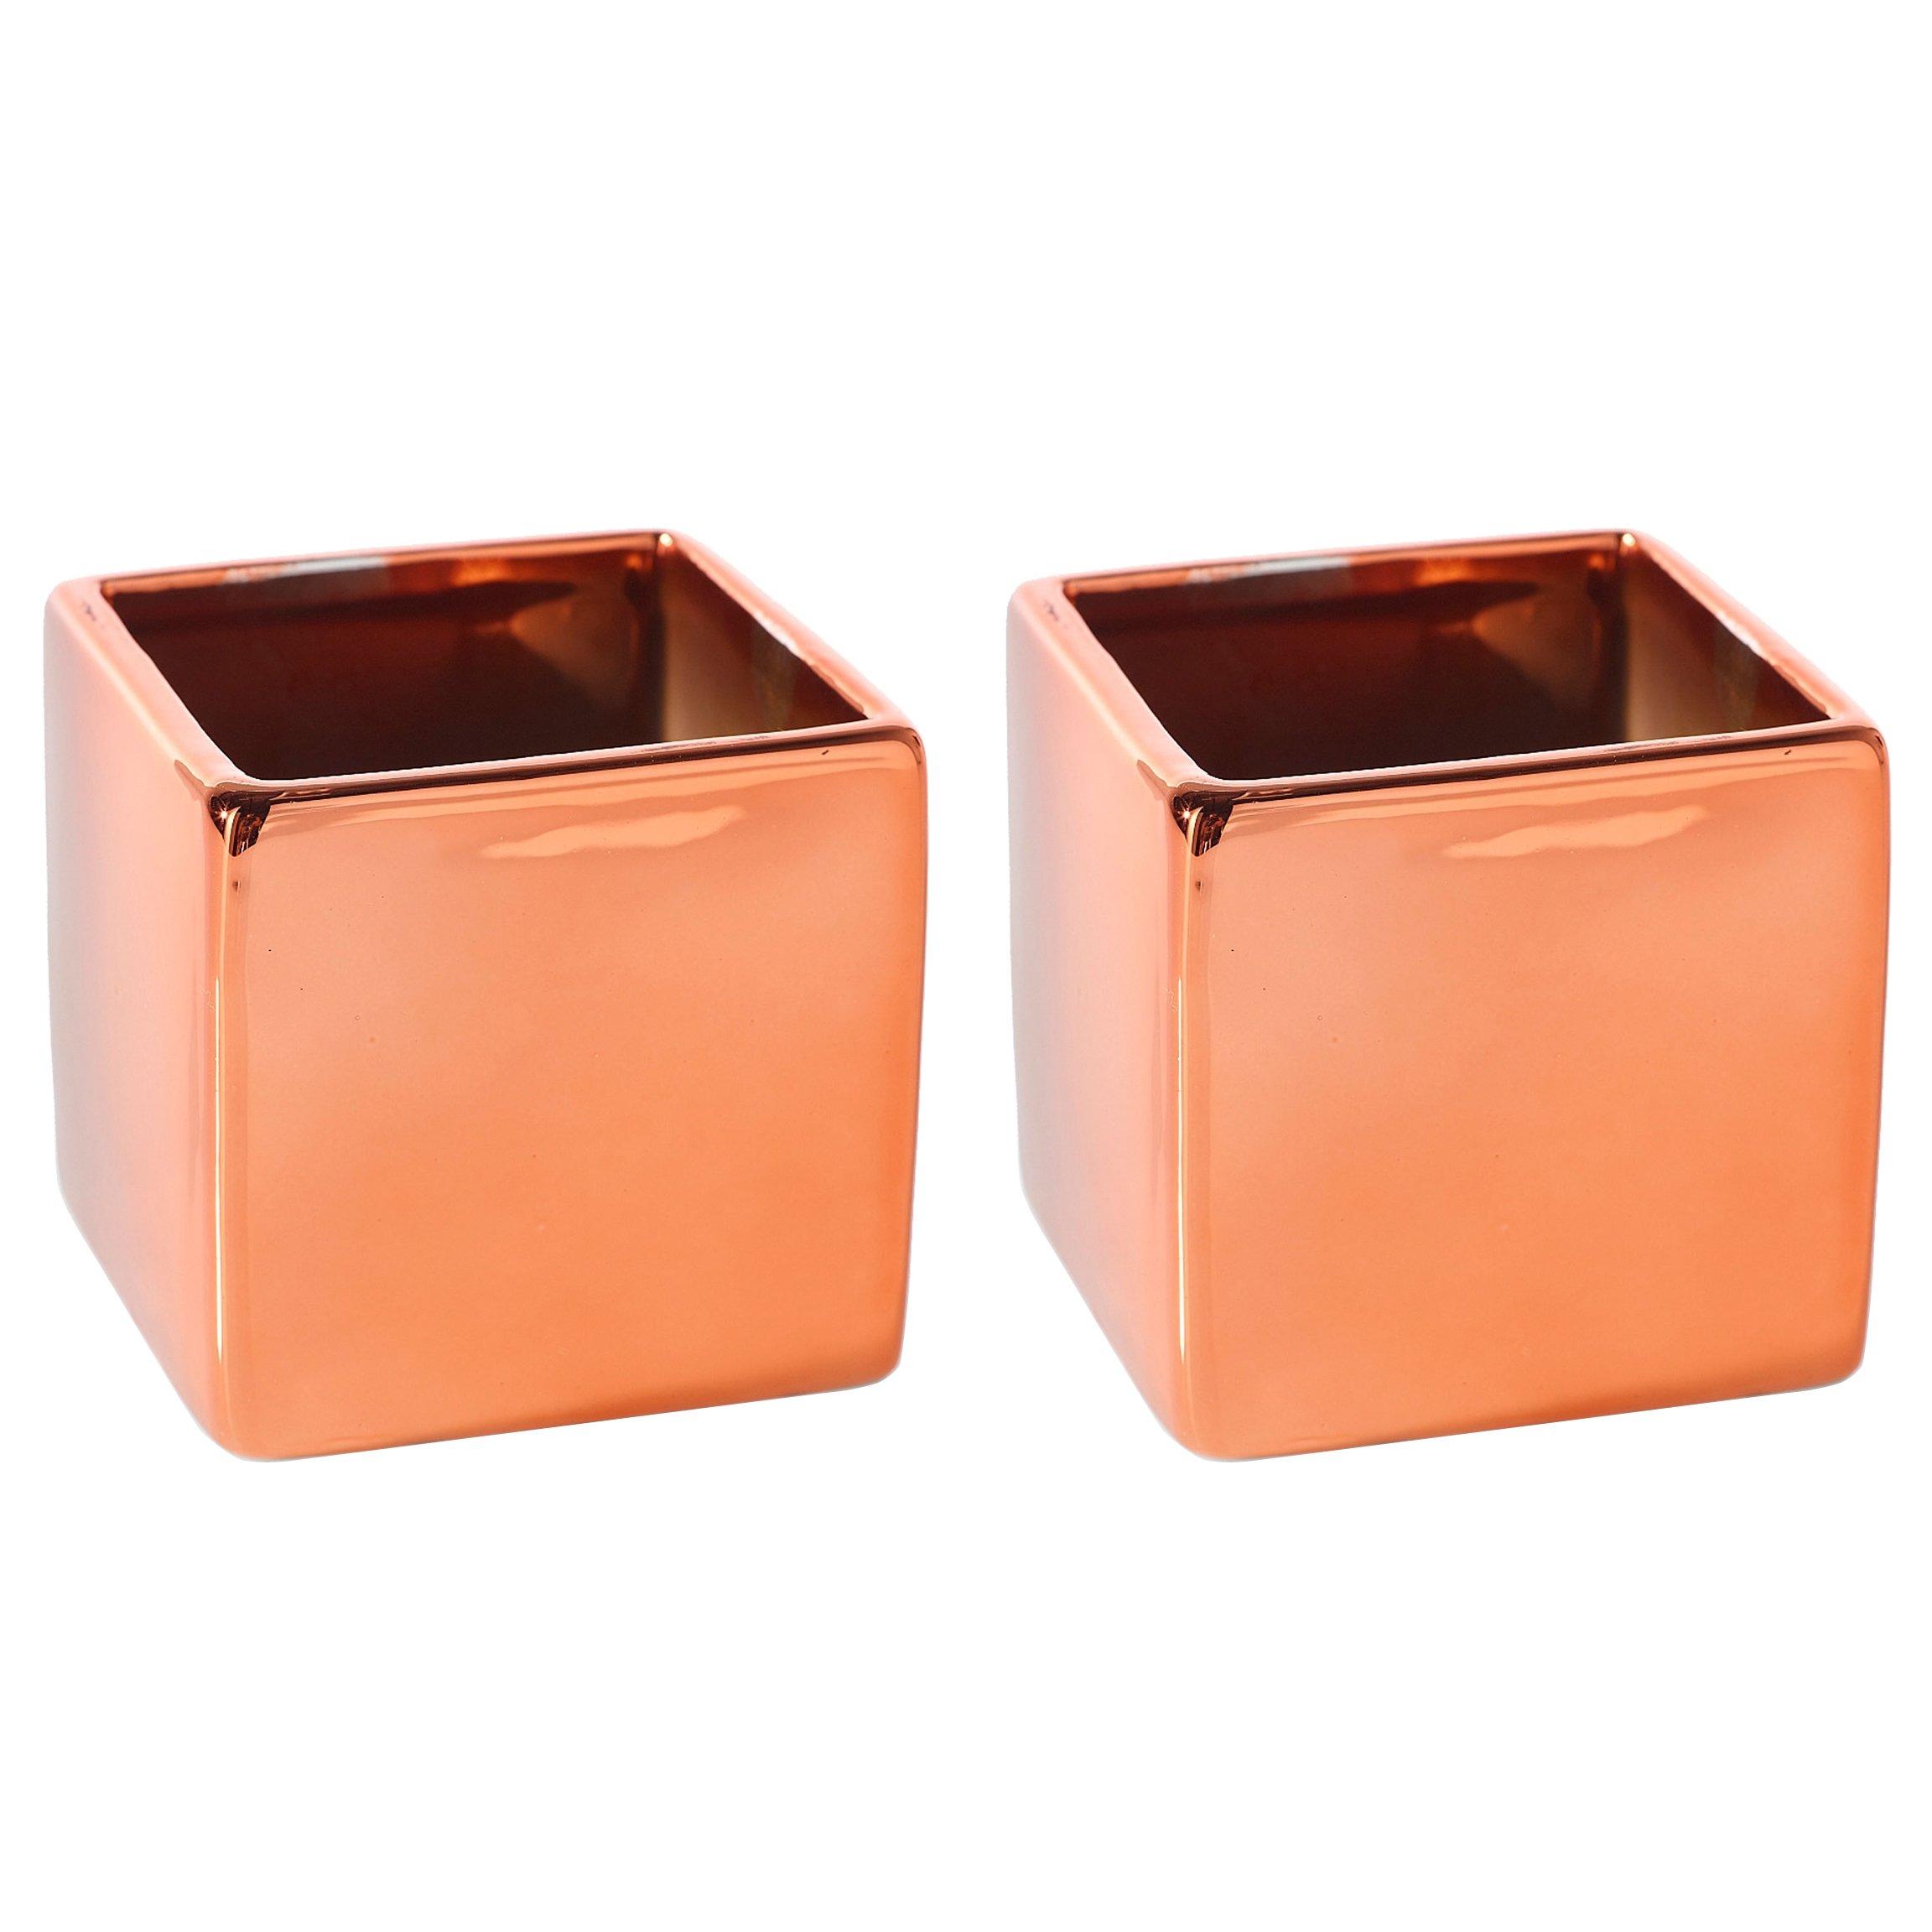 Copper Metallic Square Vase - Set of 2 - 3.25 x 3.25 Inches - Ceramic Urban Decor Pot - Small Modern Cube Planter for Office or Home